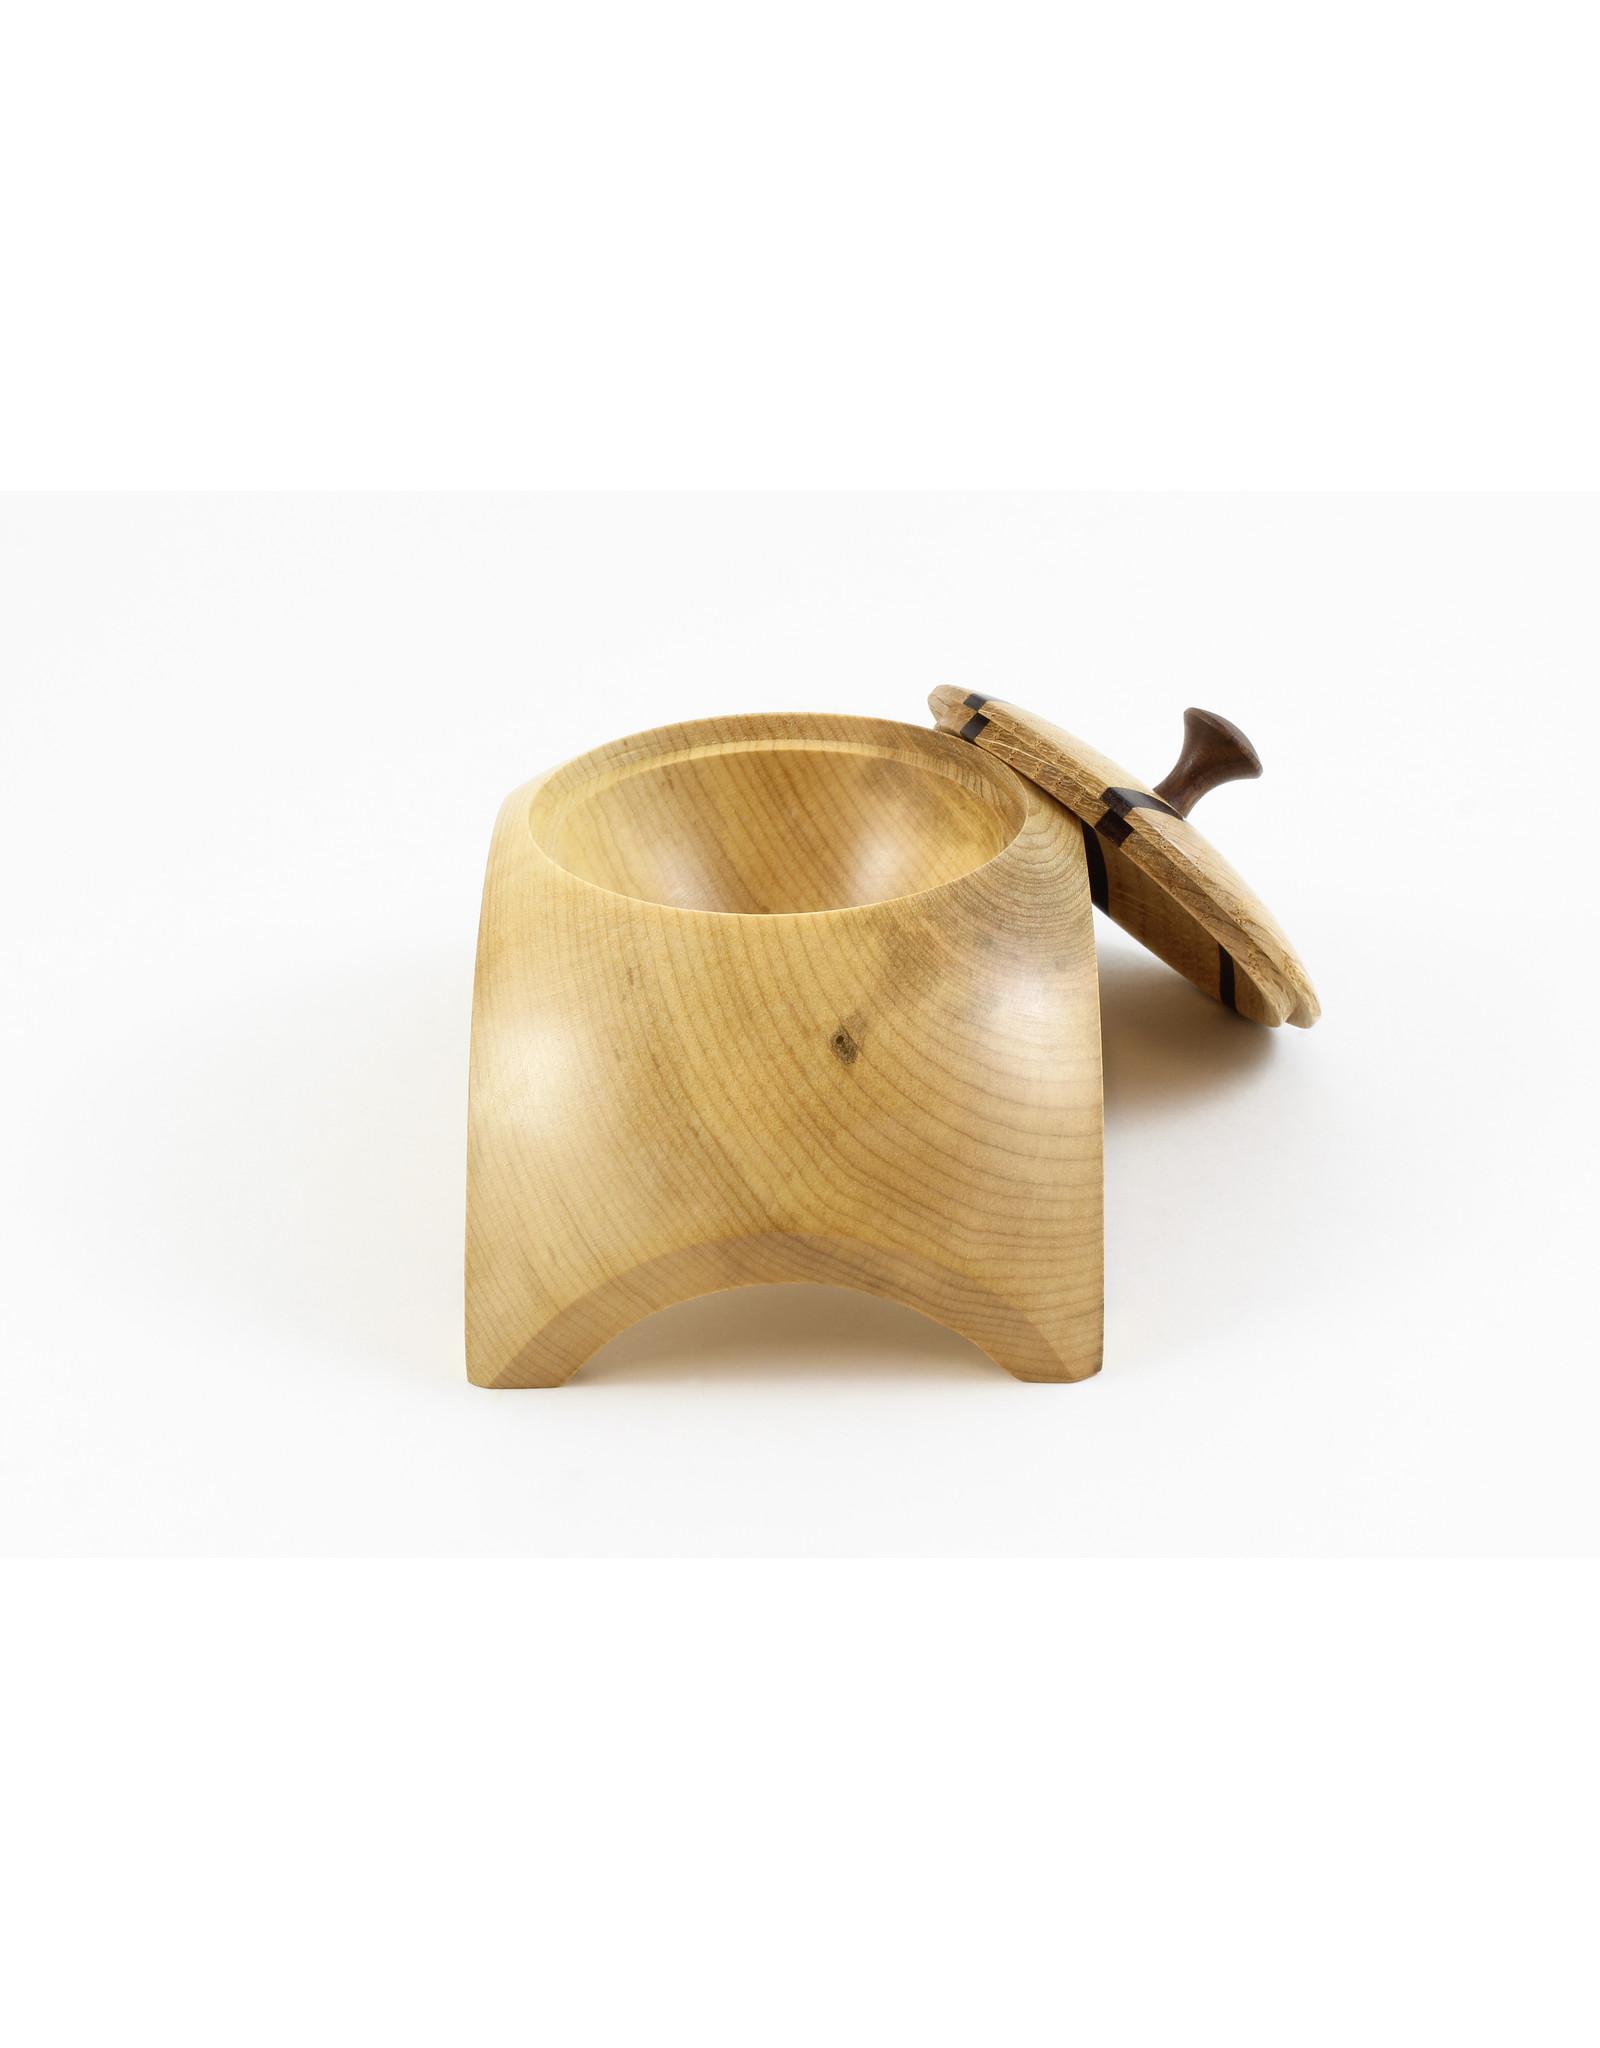 Hugh Ross Maple, Oak and Walnut Box by Hugh Ross